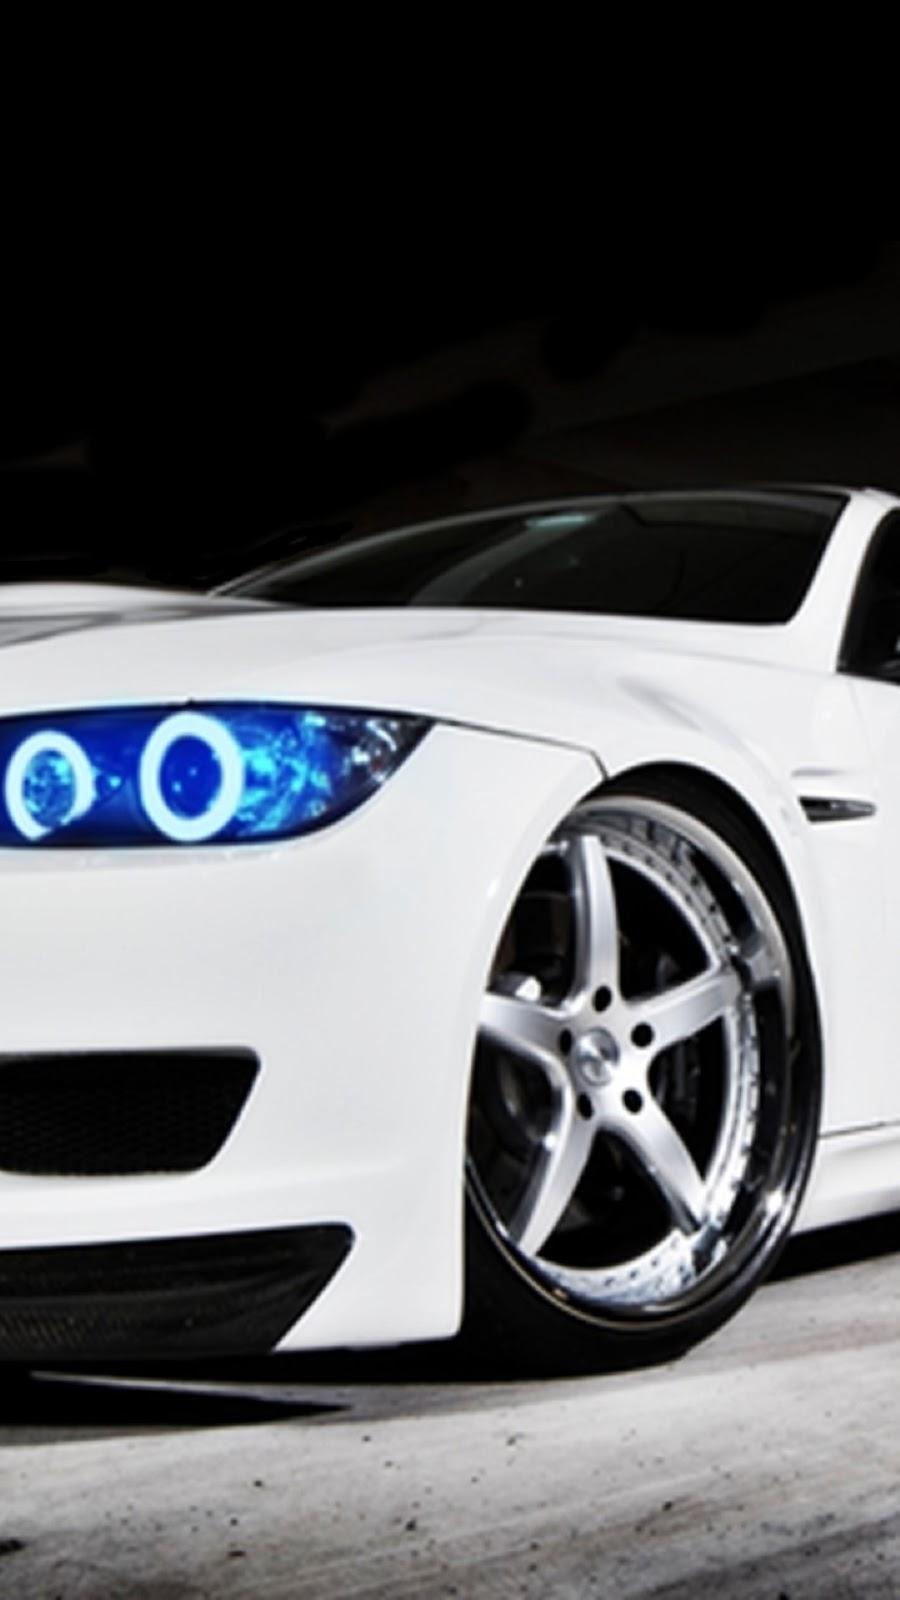 Wallpaper Android BMW M3 Putih Biru